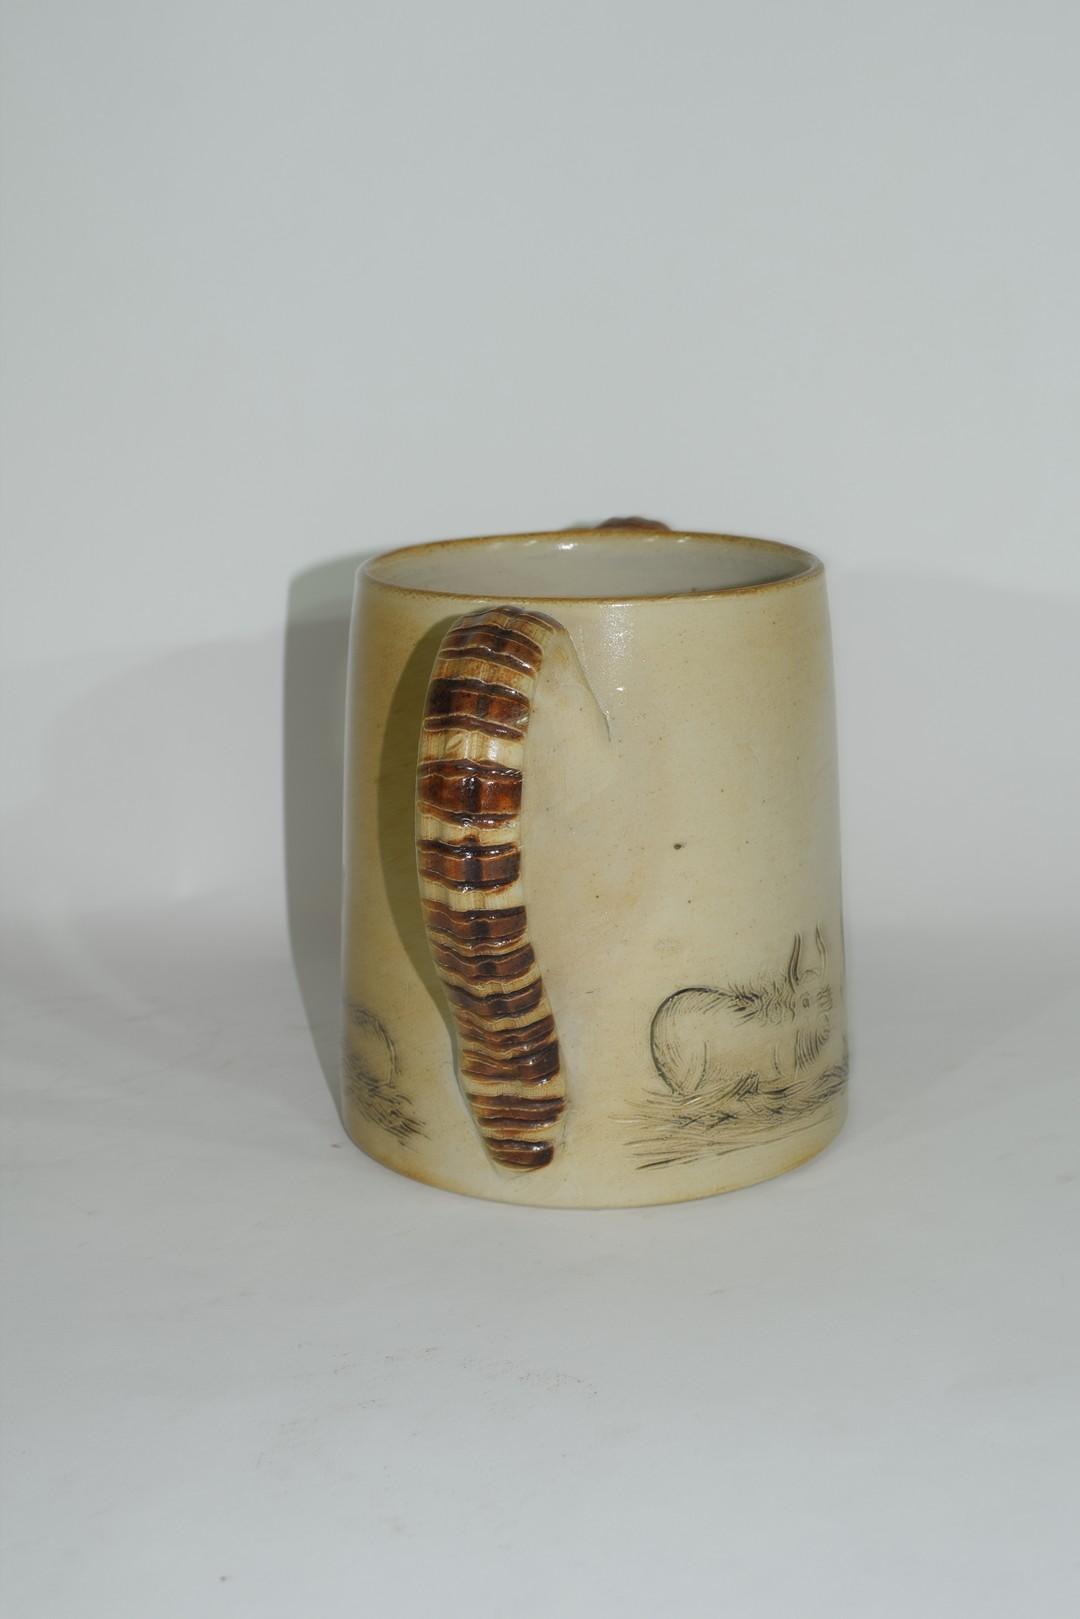 Smith & Co salt glazed two handled mug or tyg - Image 2 of 6